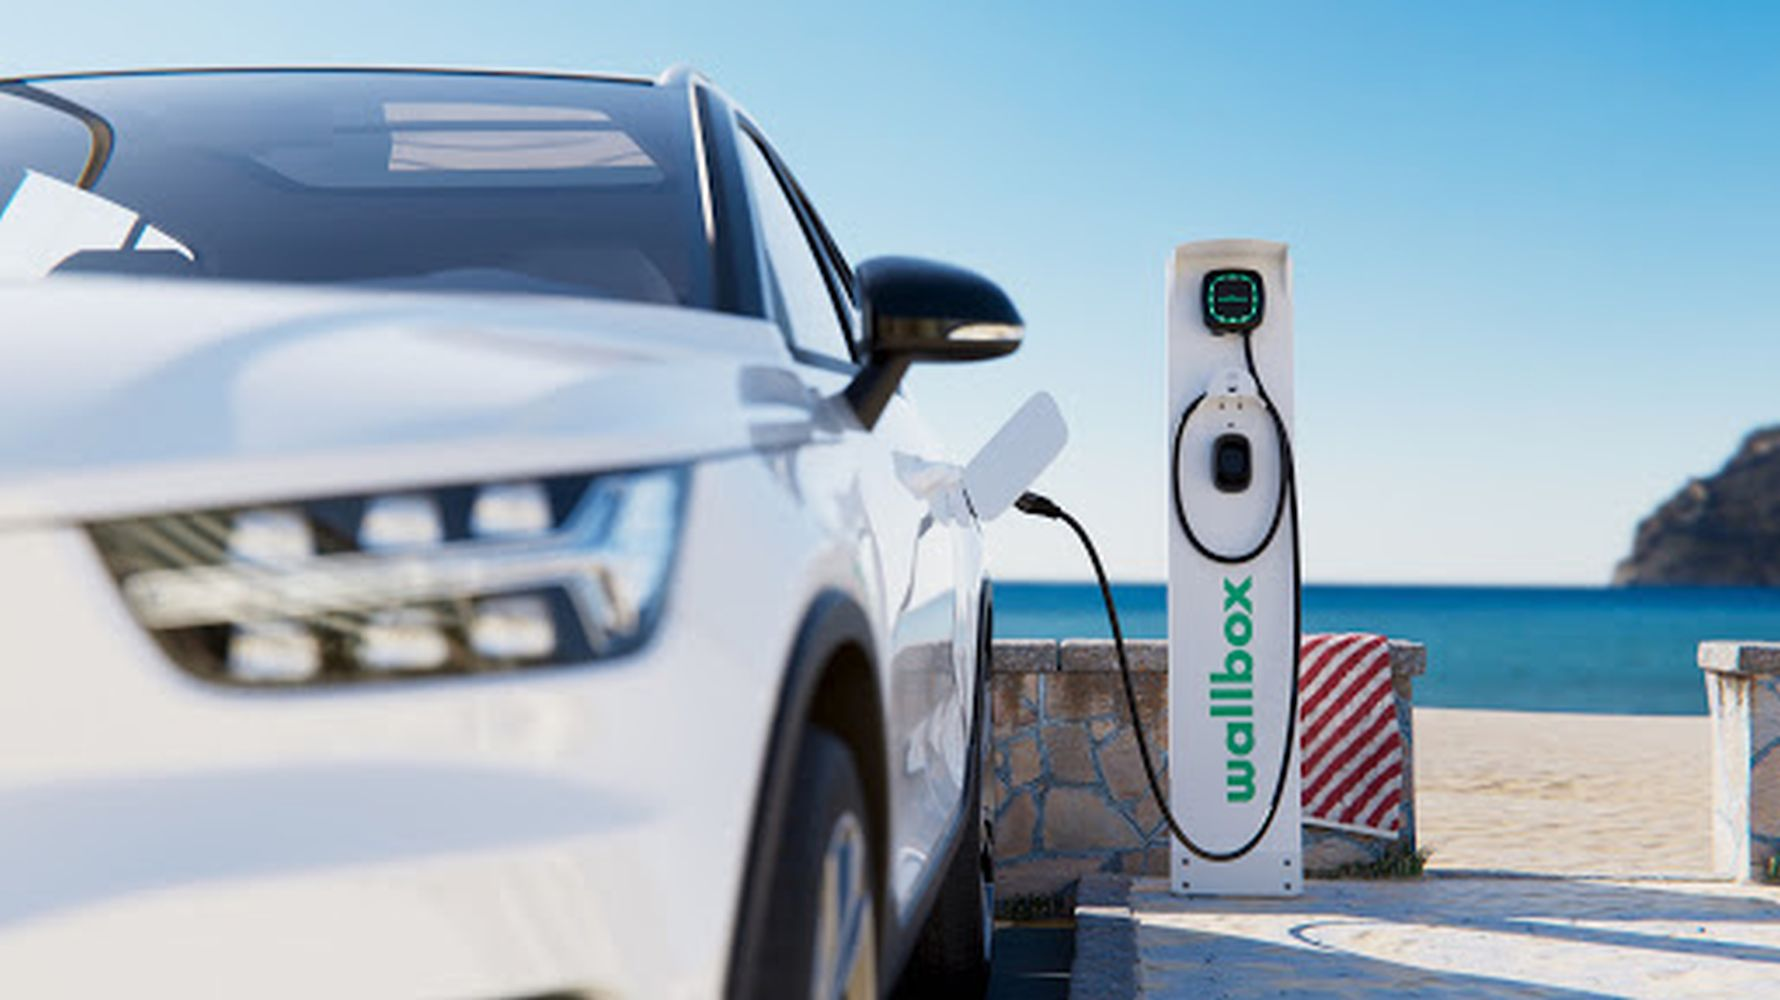 smart charging station wallbox turkiyede a leading brand that dunyanin